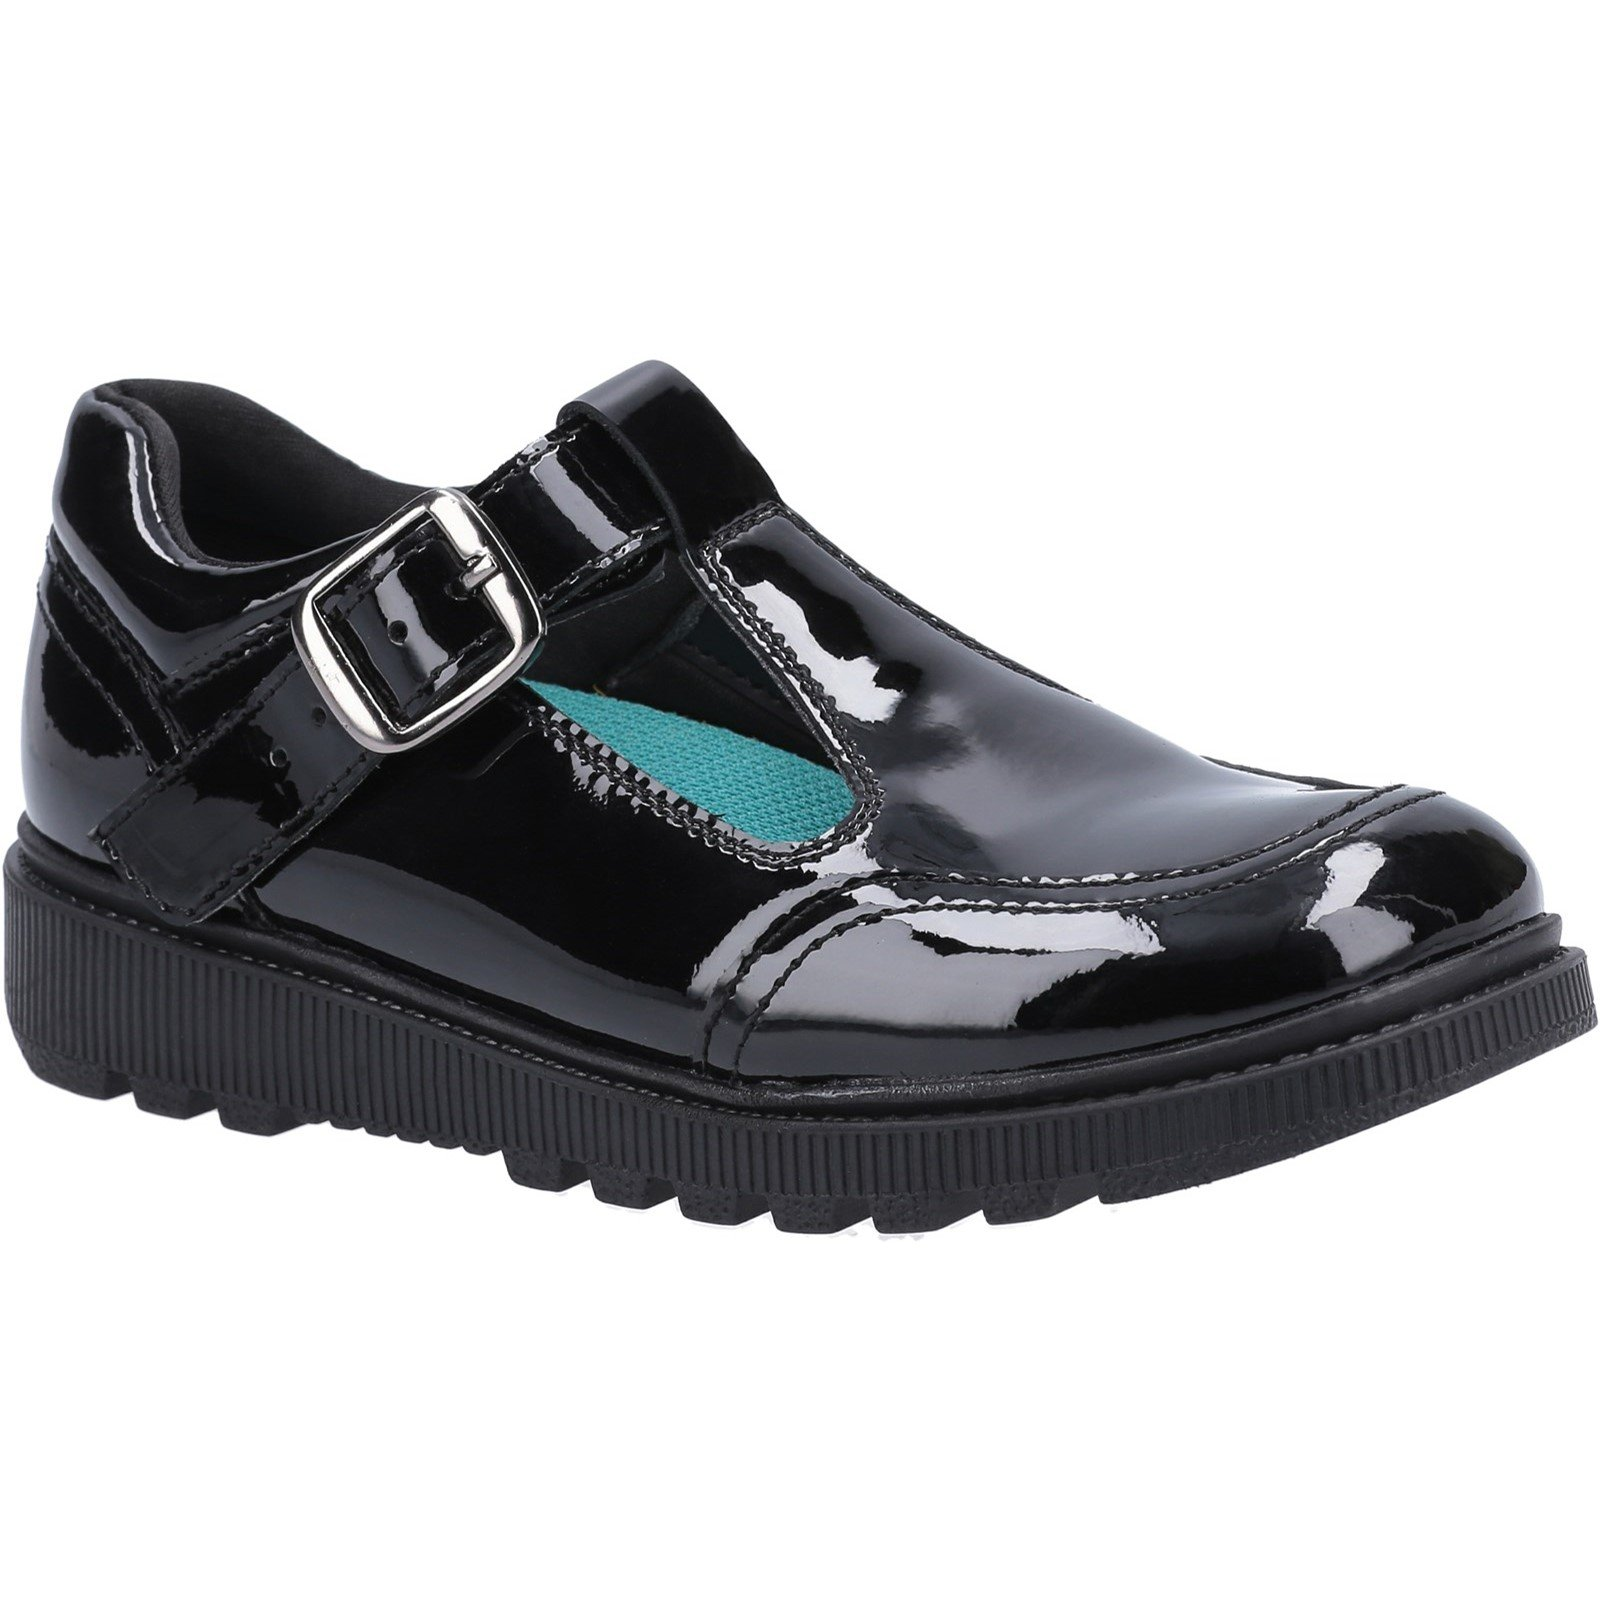 Hush Puppies Kid's Kerry Senior School Shoe Patent Black 30820 - Patent Black 3